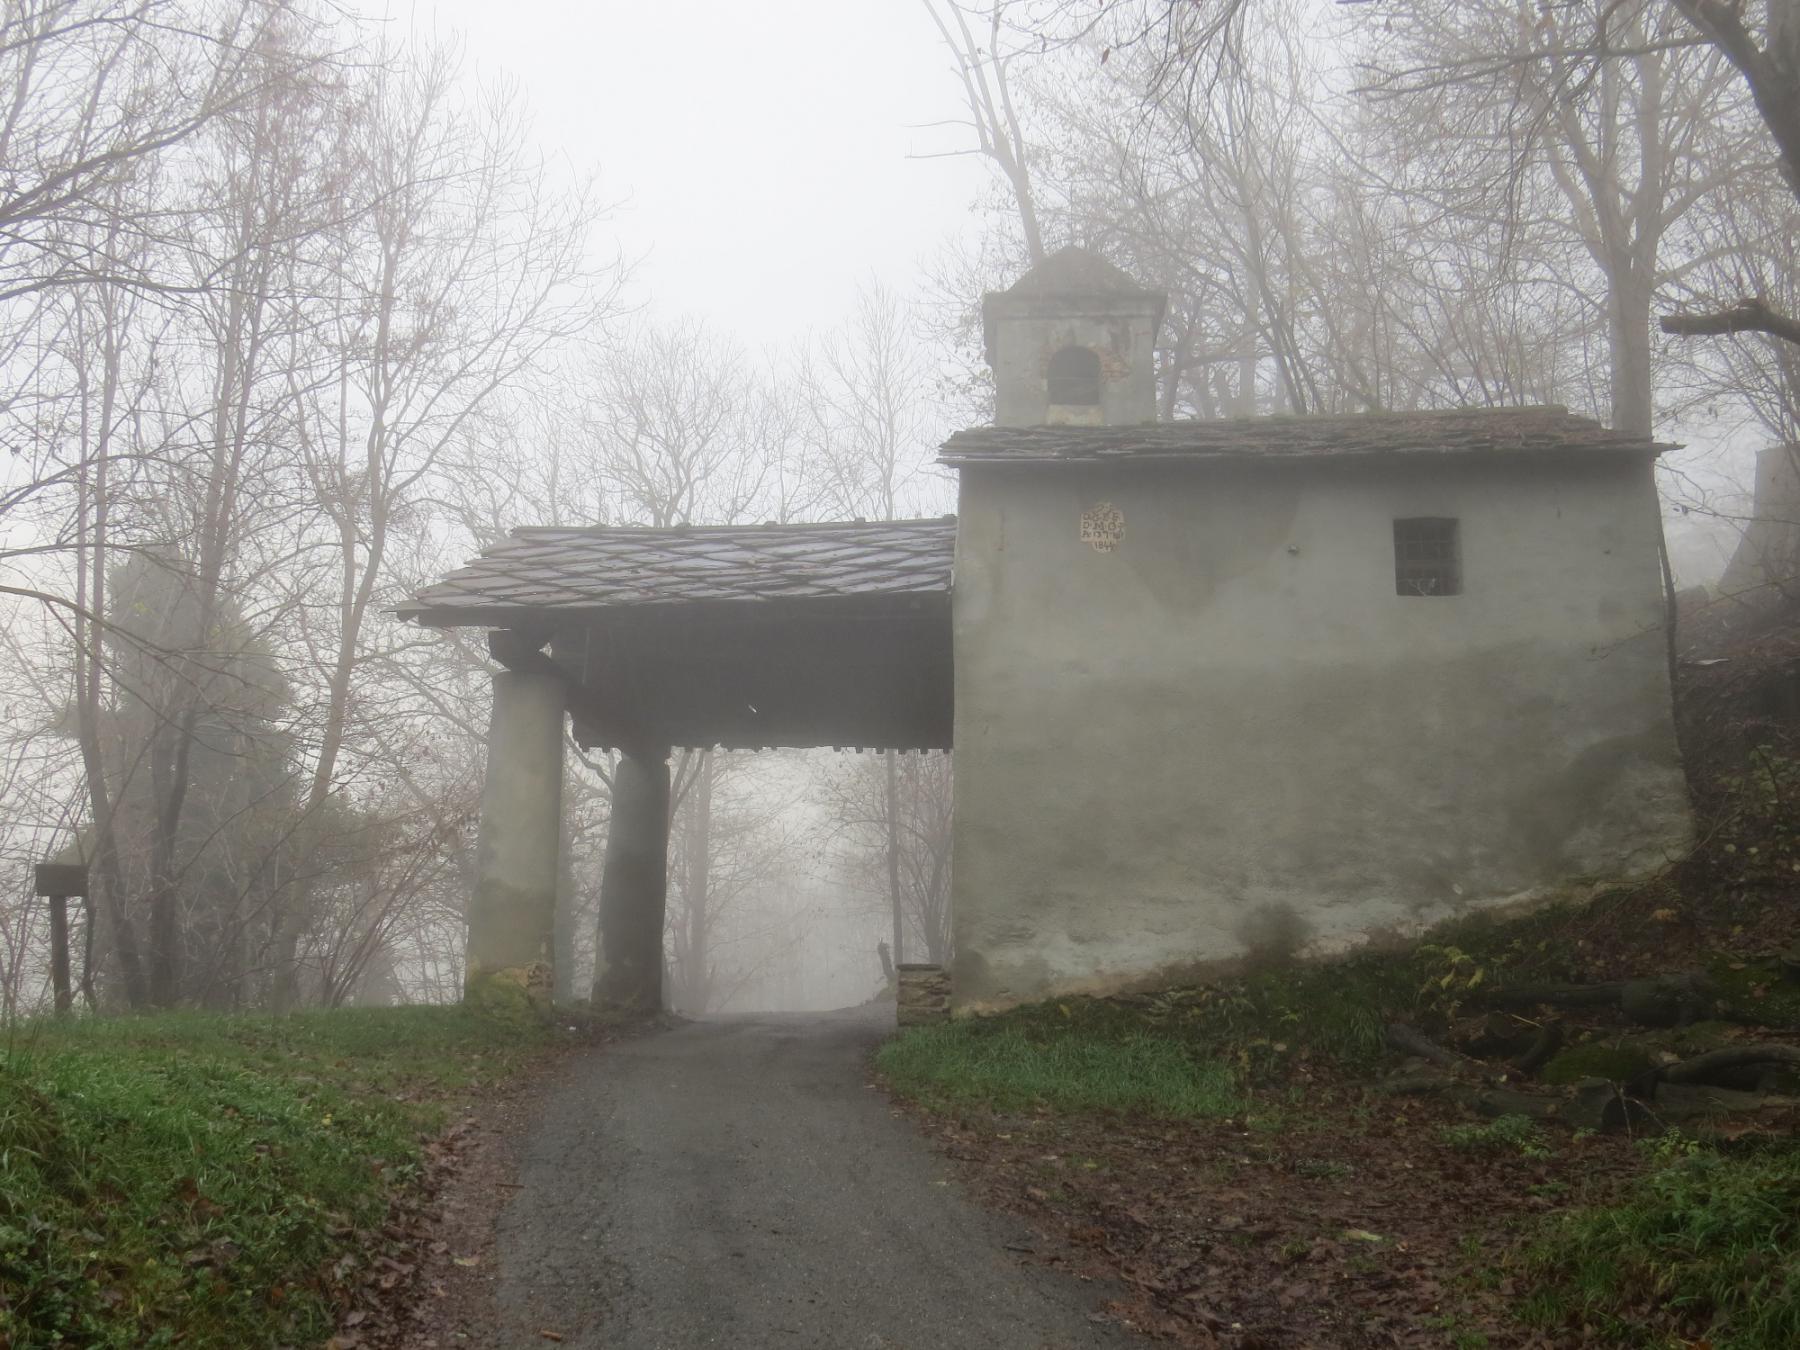 Cappella del Malpasso